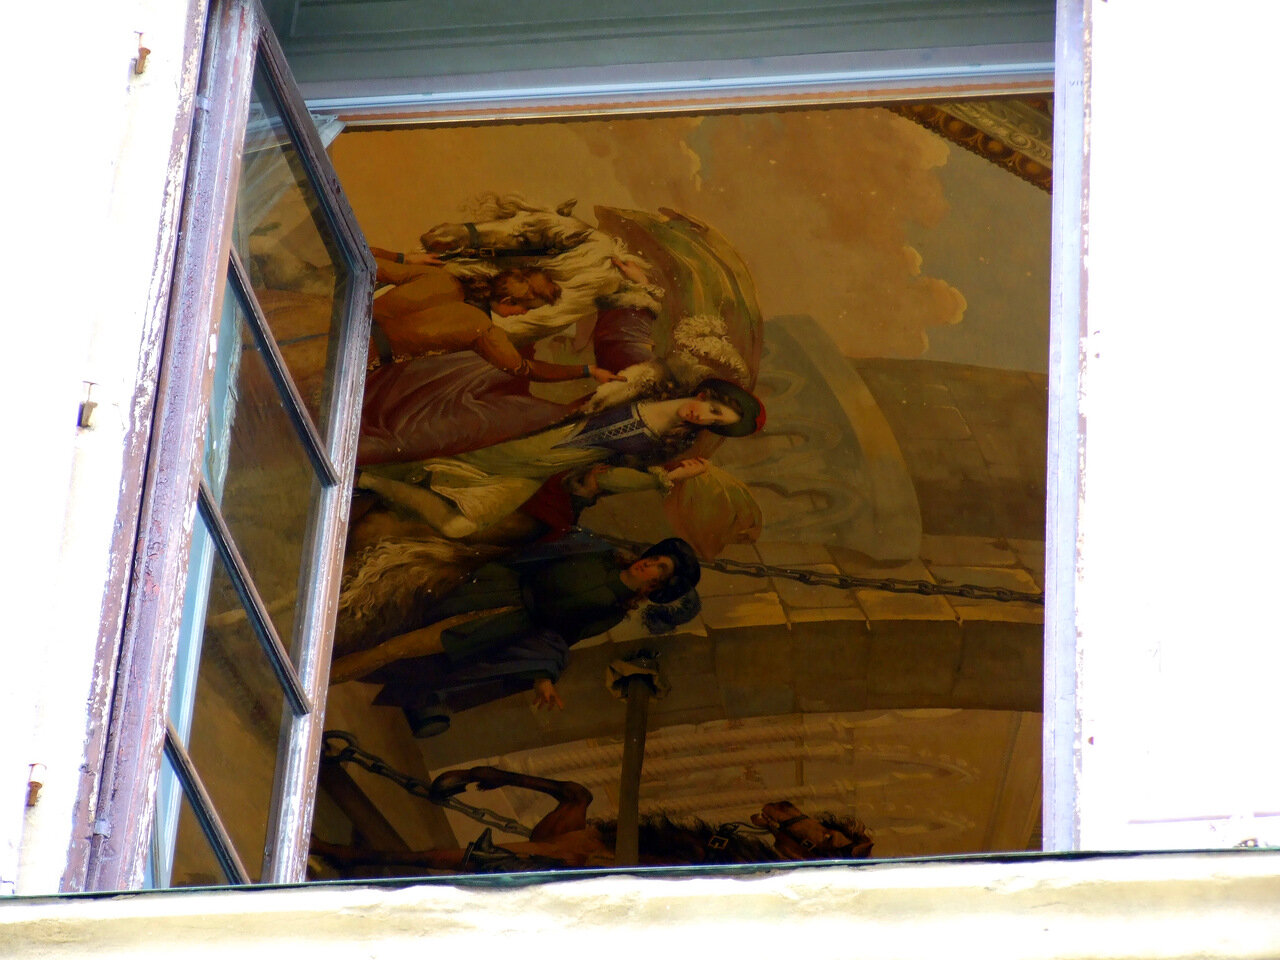 Случайно бросил взгляд в окно обычного дома, а там... фрески на потолке